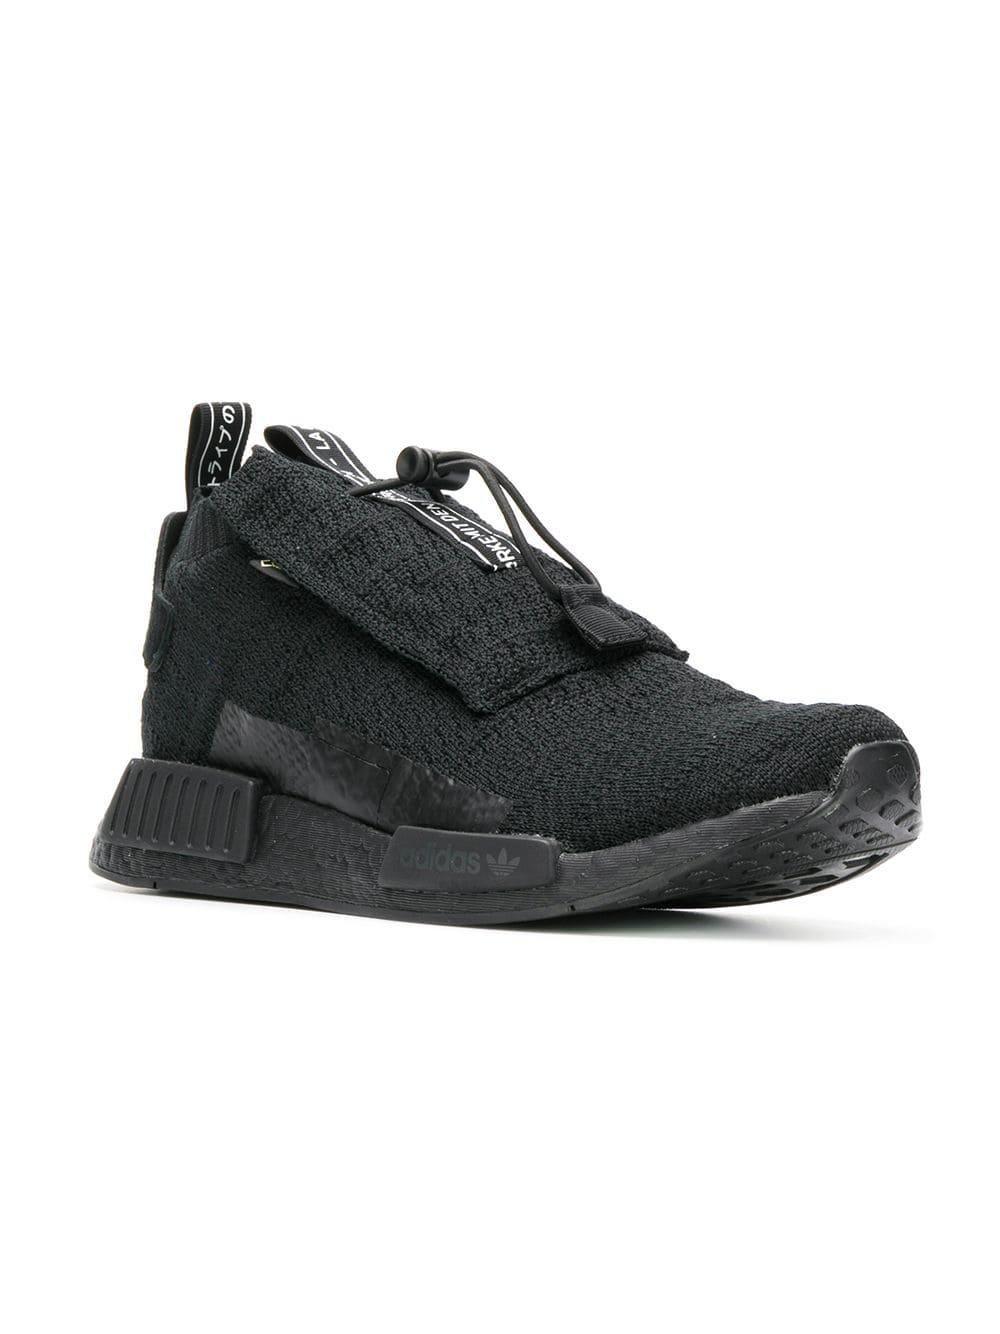 25e8c219f1ec44 adidas Black Nmd Ts1 Pk Gore-tex Primeknit Sneakers in Black for Men - Lyst